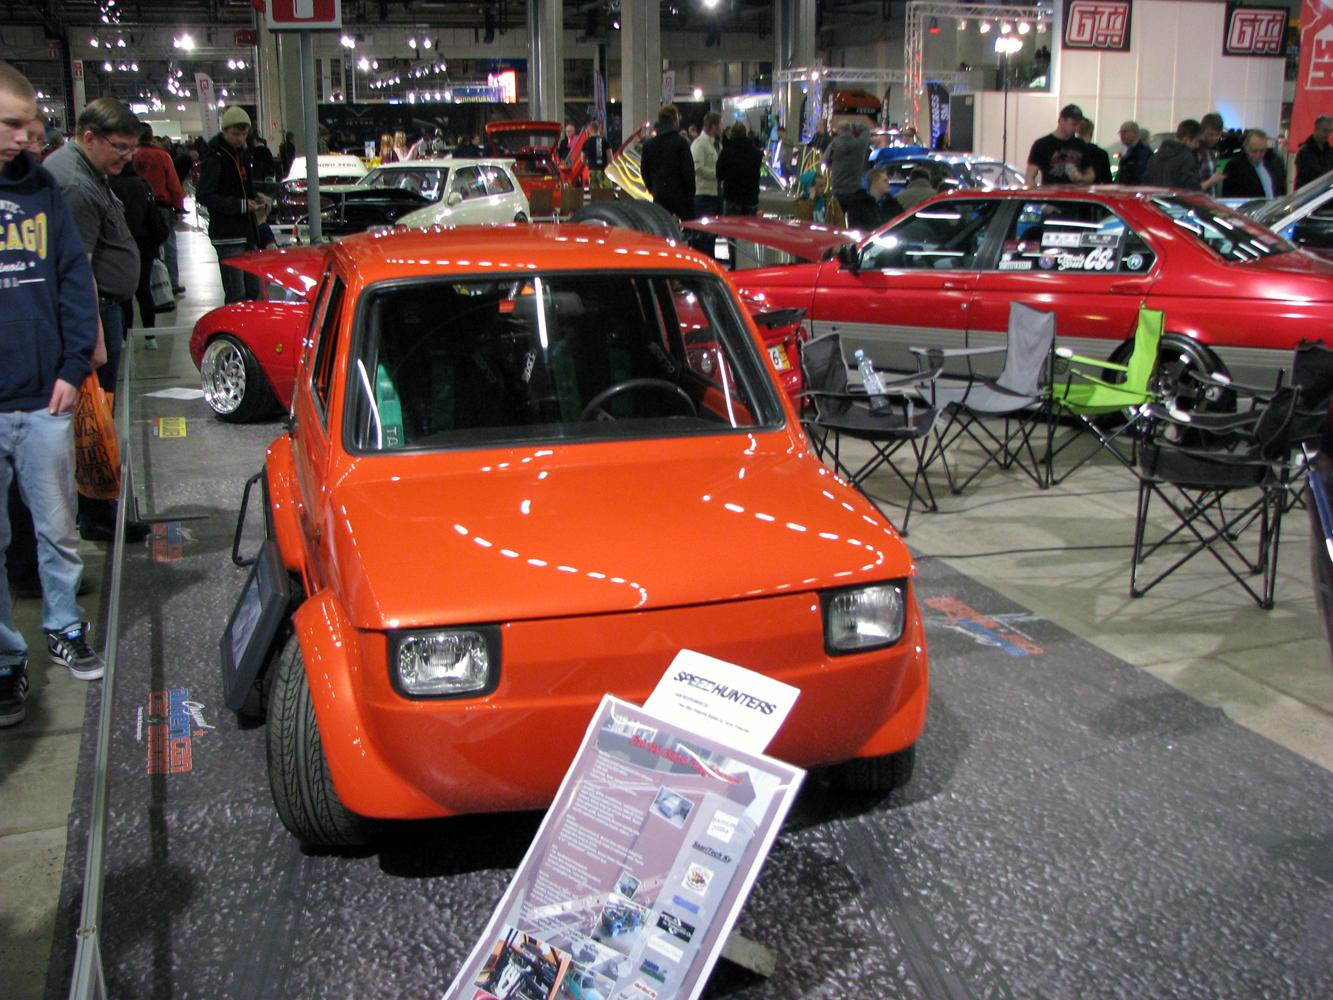 Car Show 2015 >> Tampereen Teekkarien Moottorikerho Ry Ttmk American Car